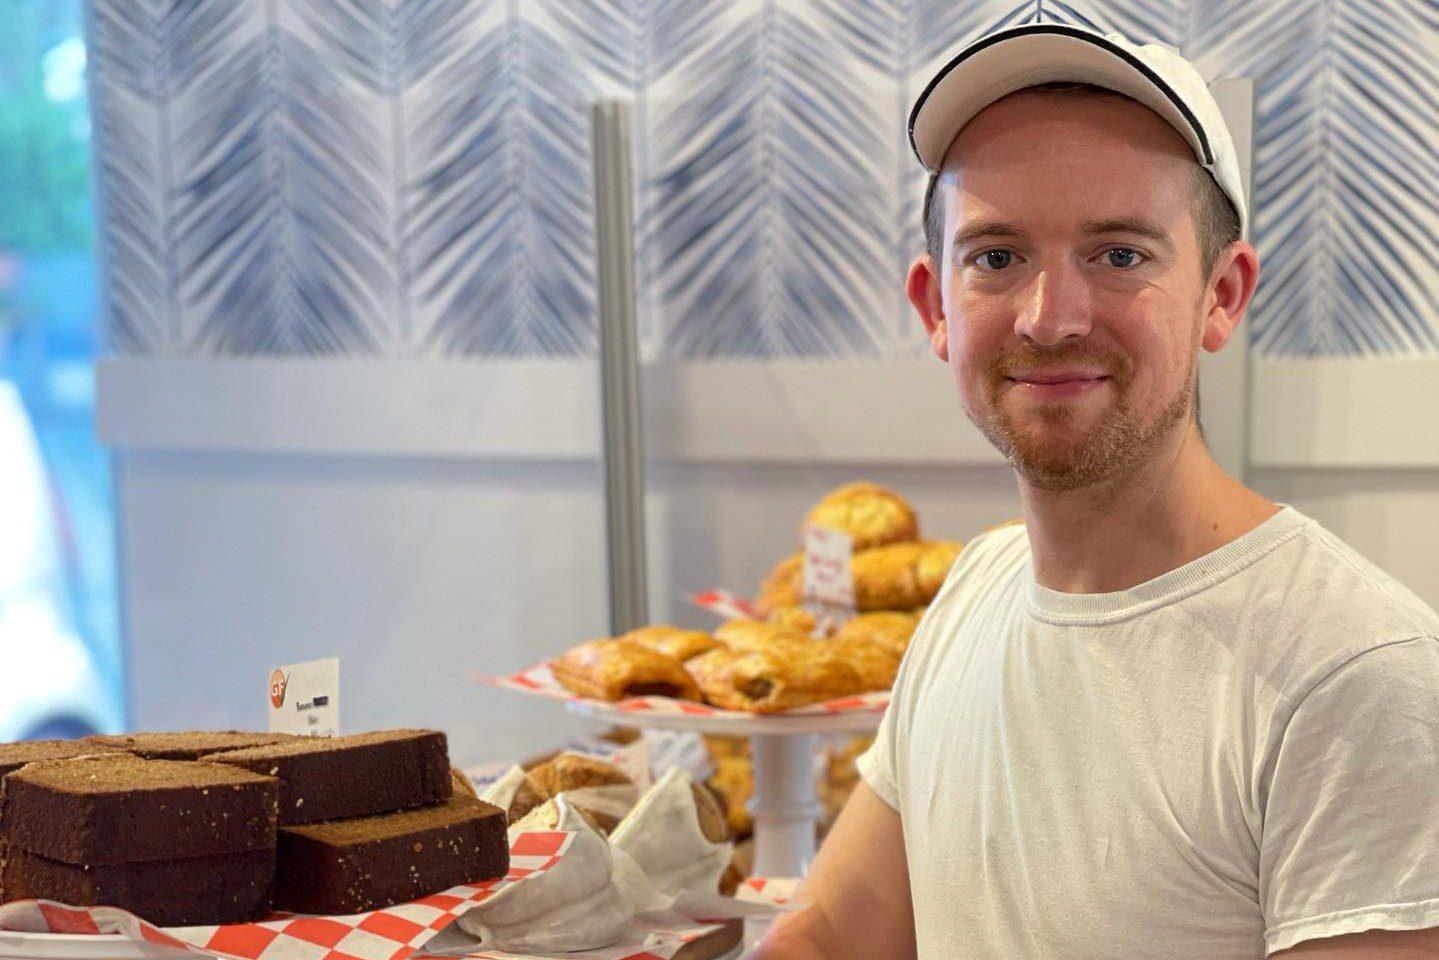 archibalds bakery date night morning